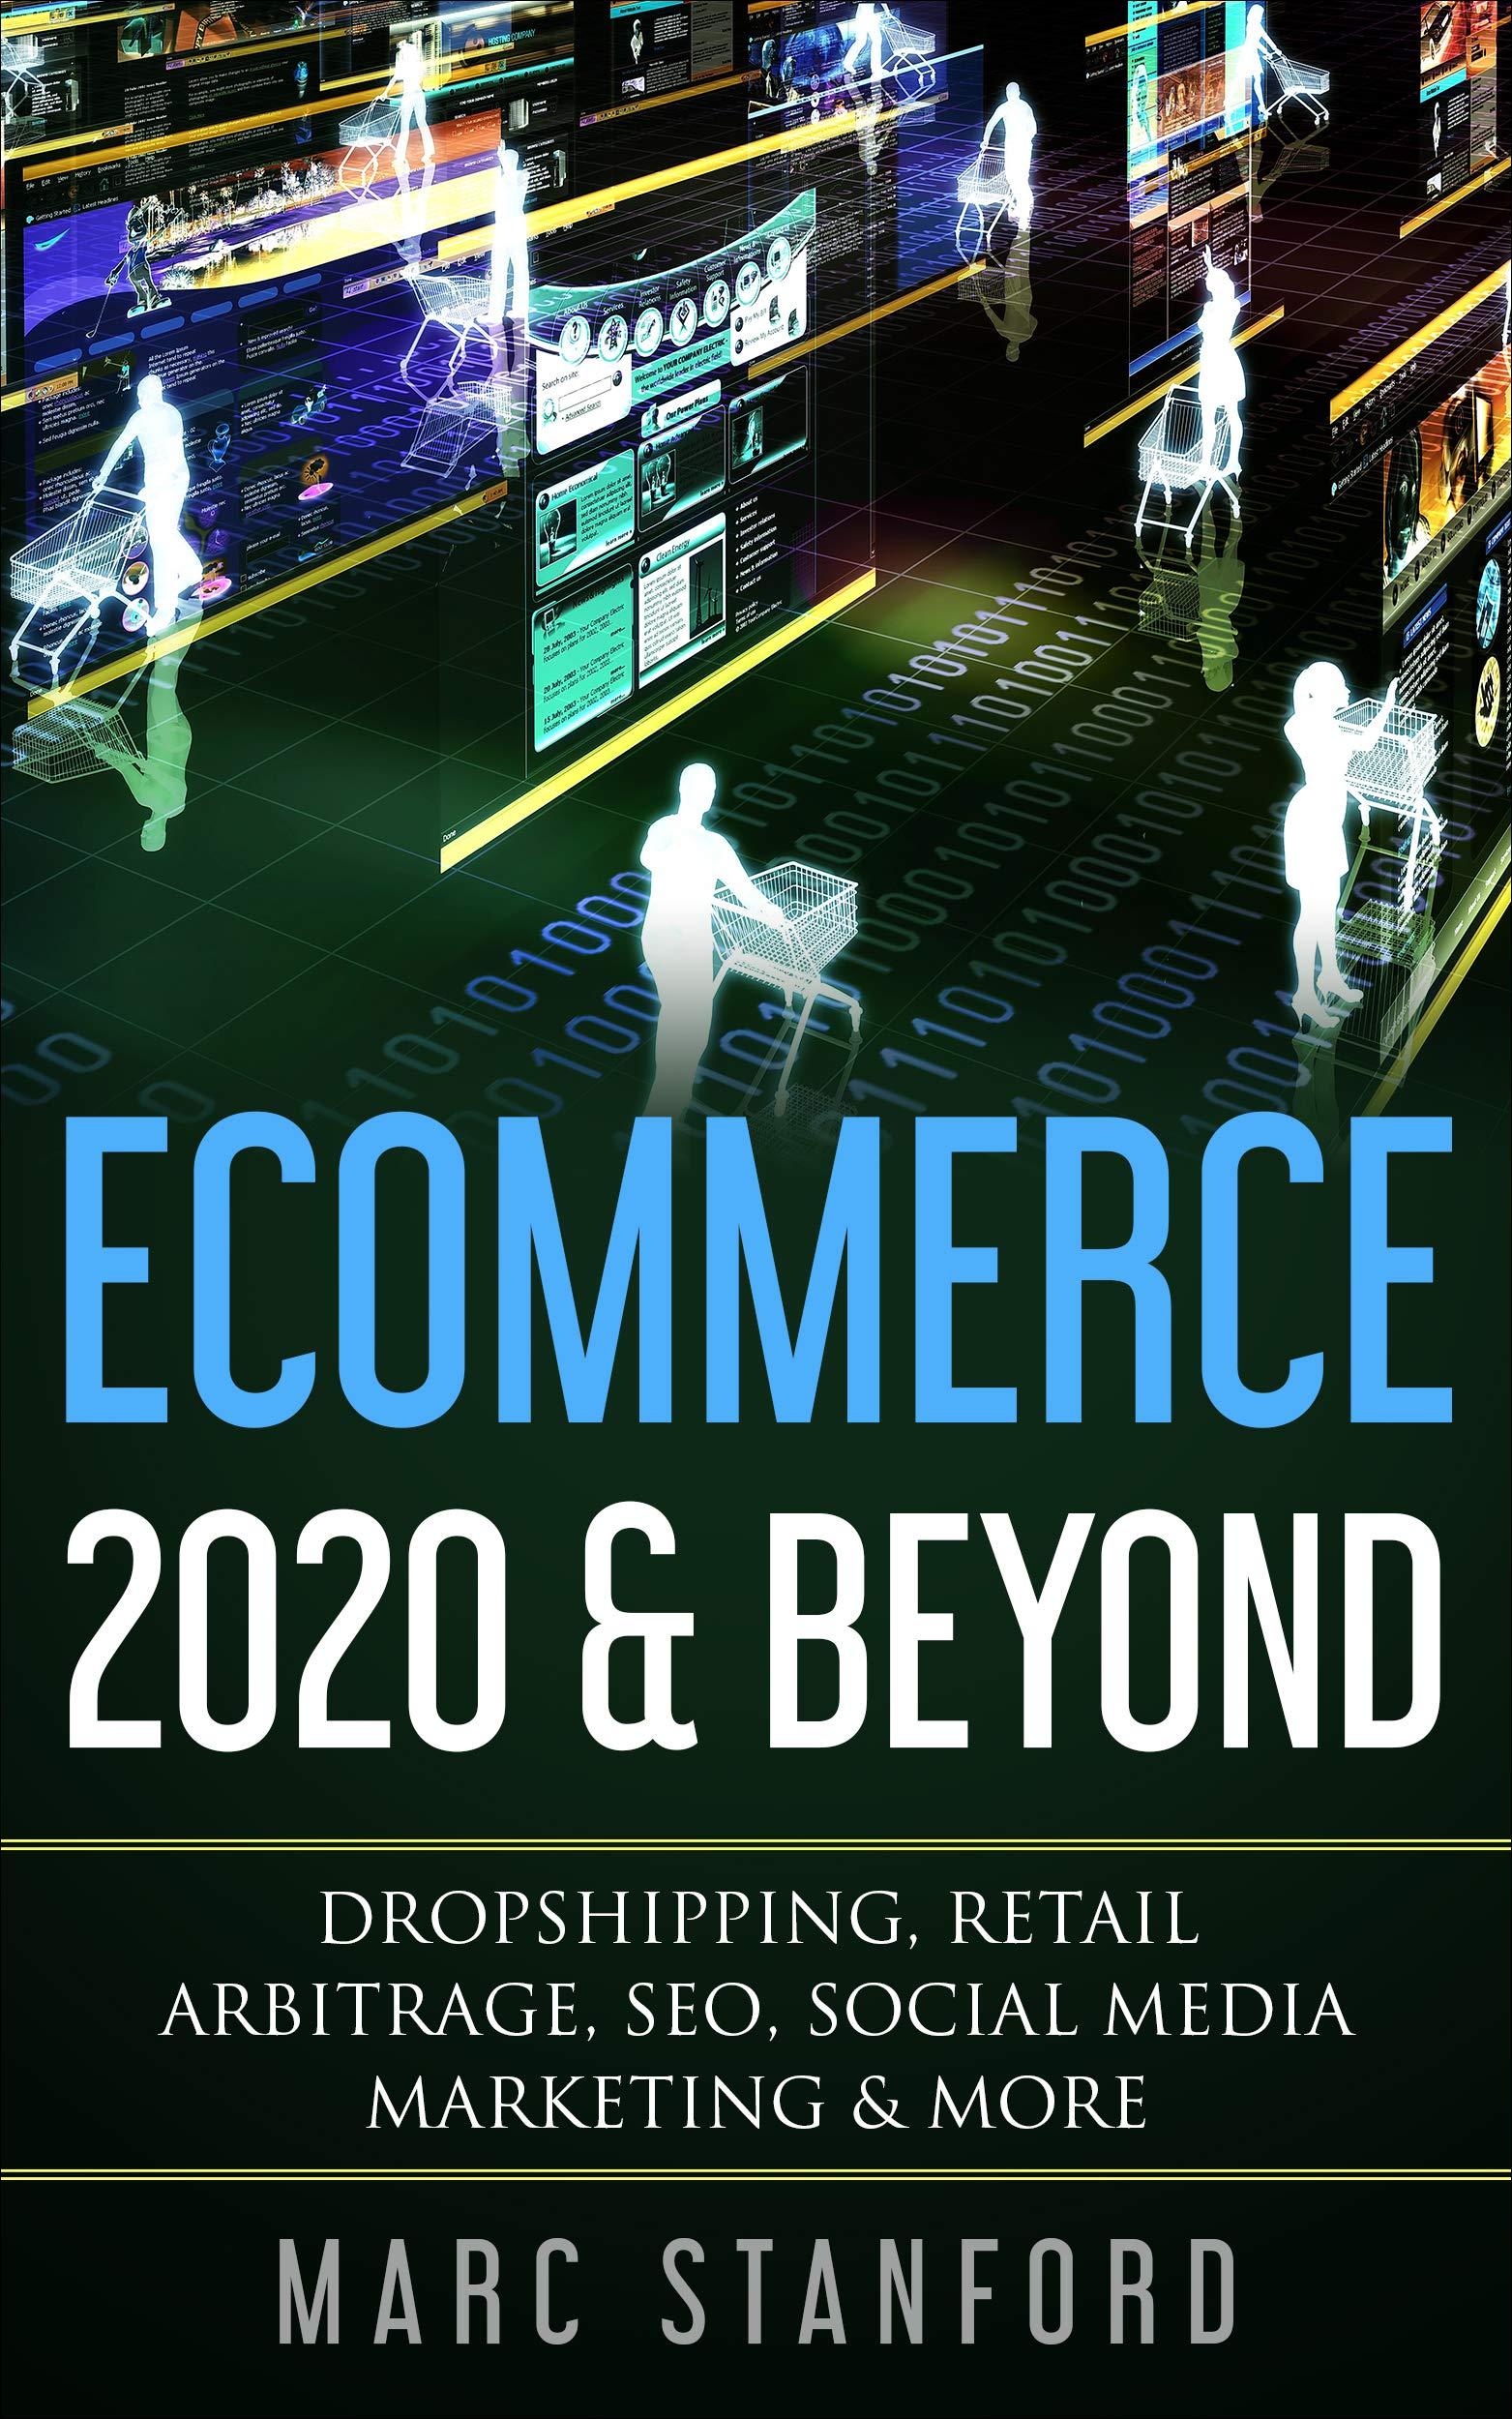 ECOMMERCE 2020 & BEYOND: Dropshipping, Retail Arbitrage, SEO, Social Media Marketing & More